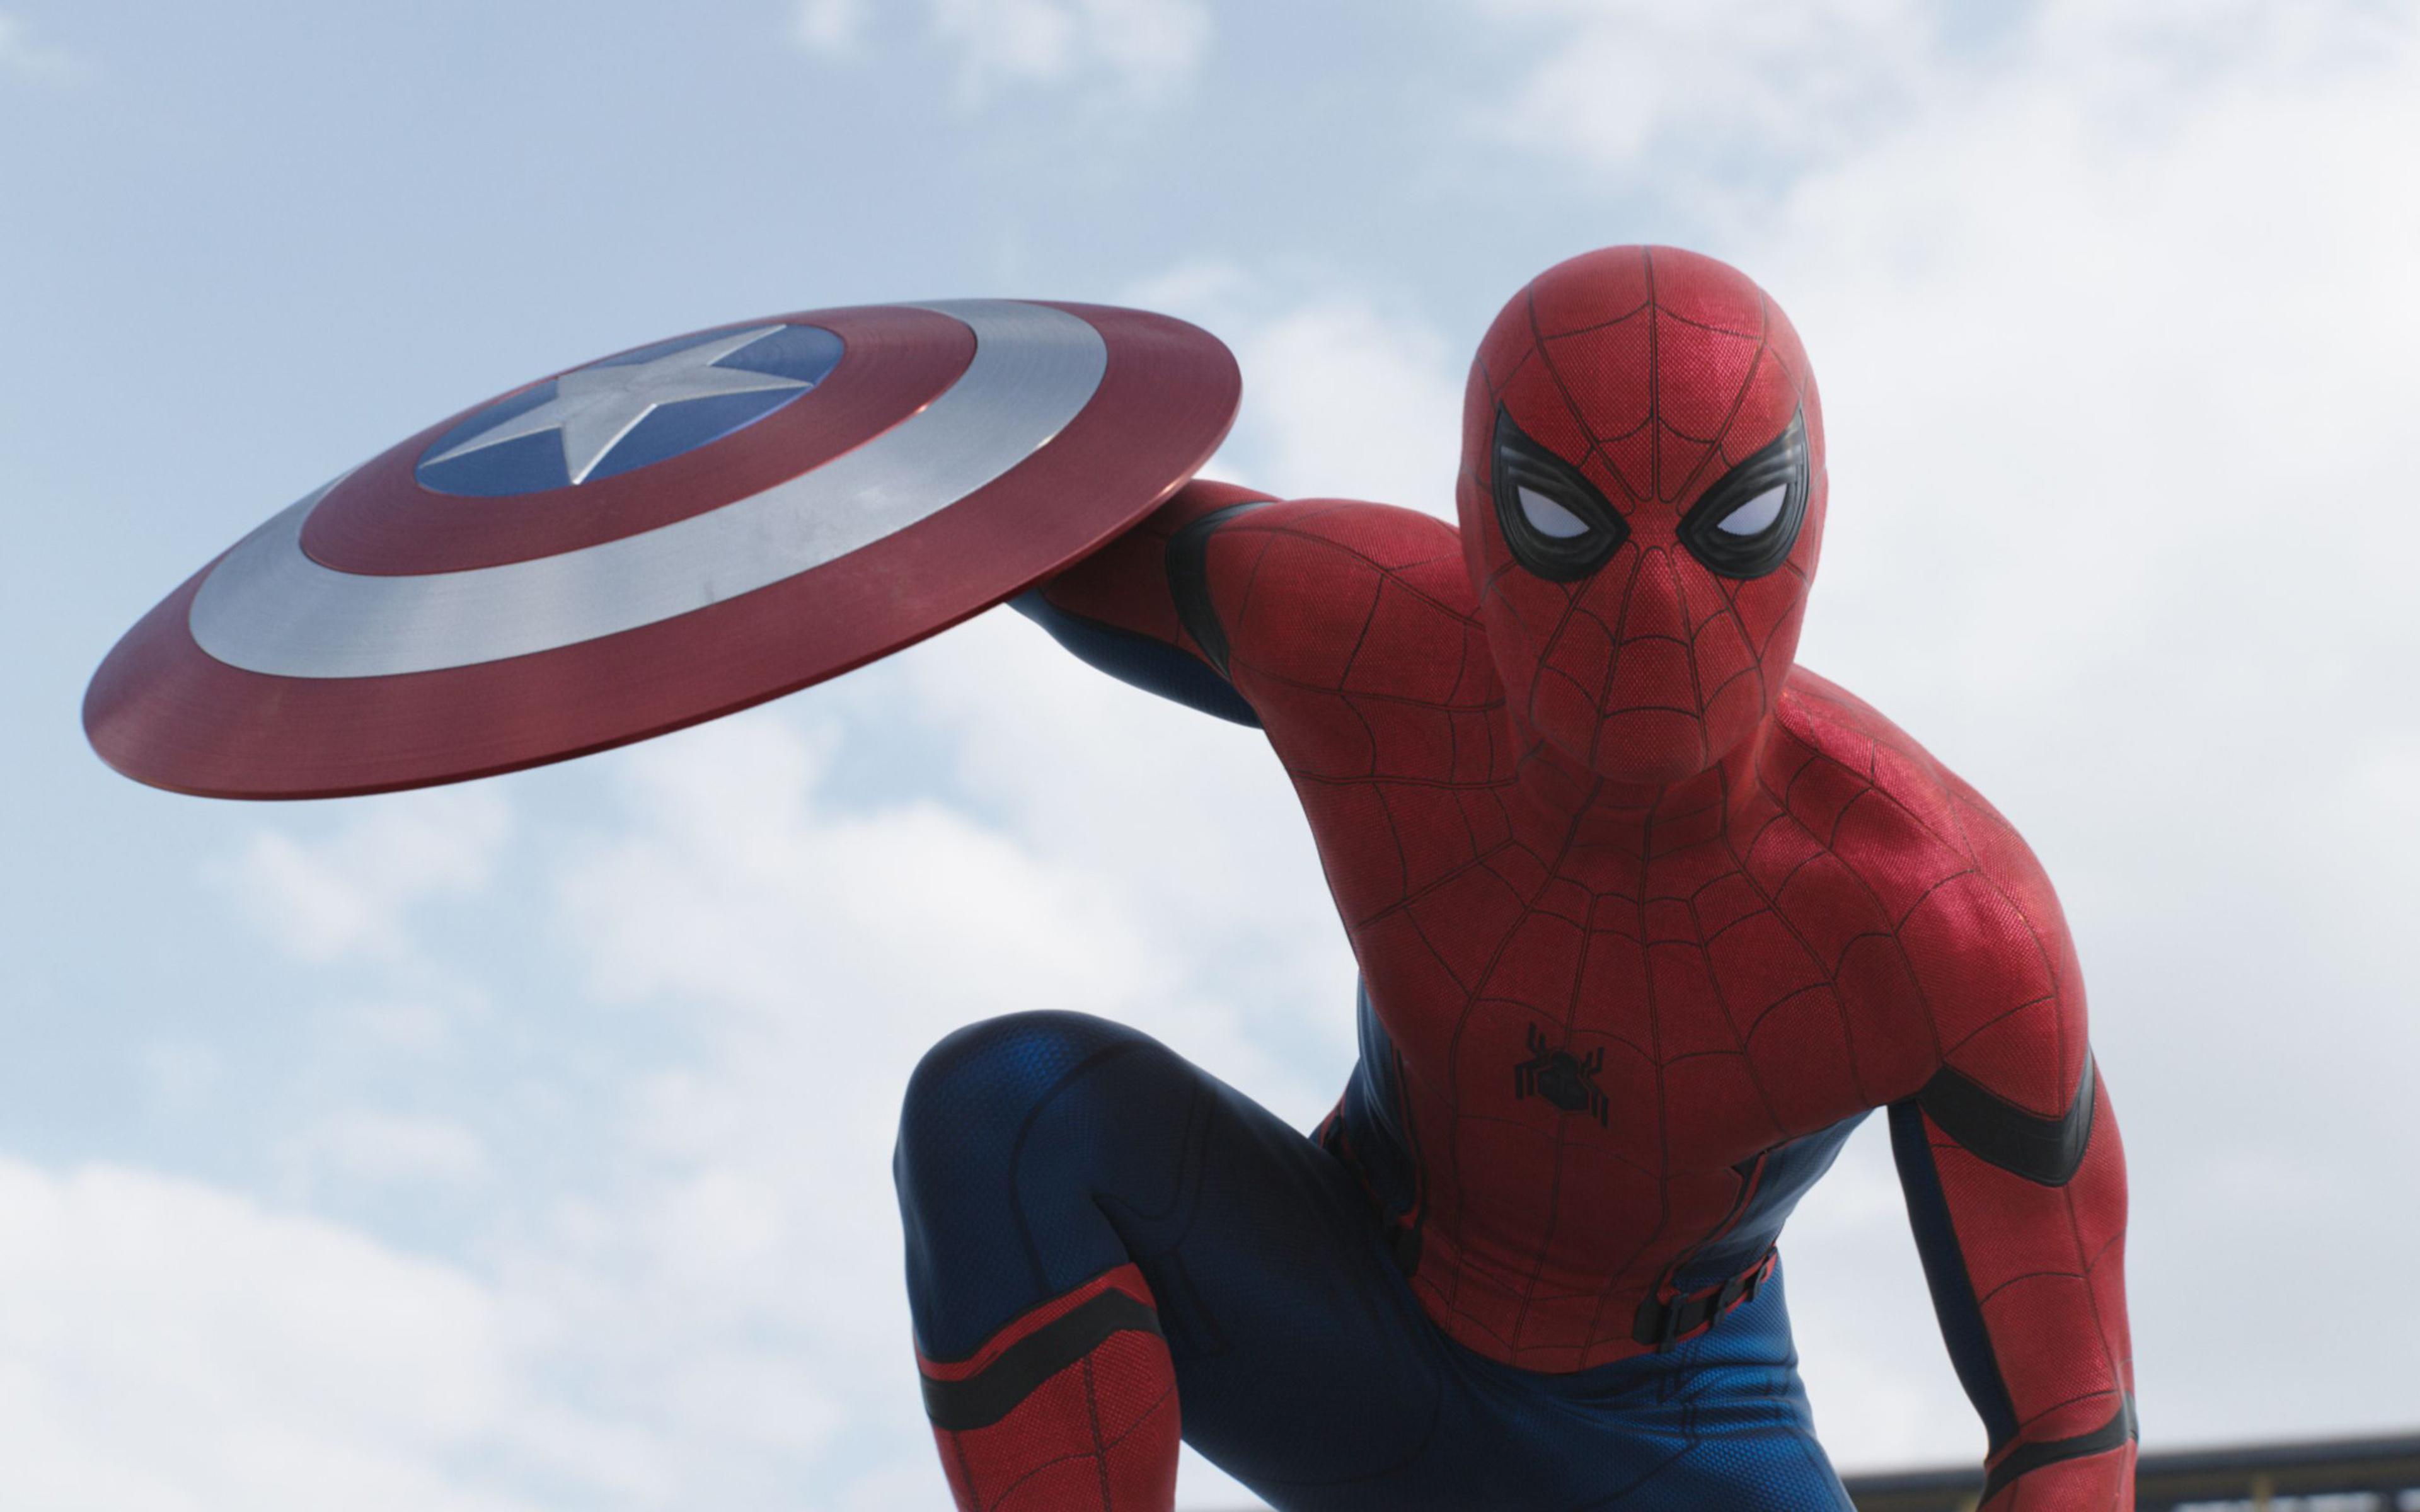 Spider Man Captain America Civil War Movie Shield Wallpaper 3840x2400